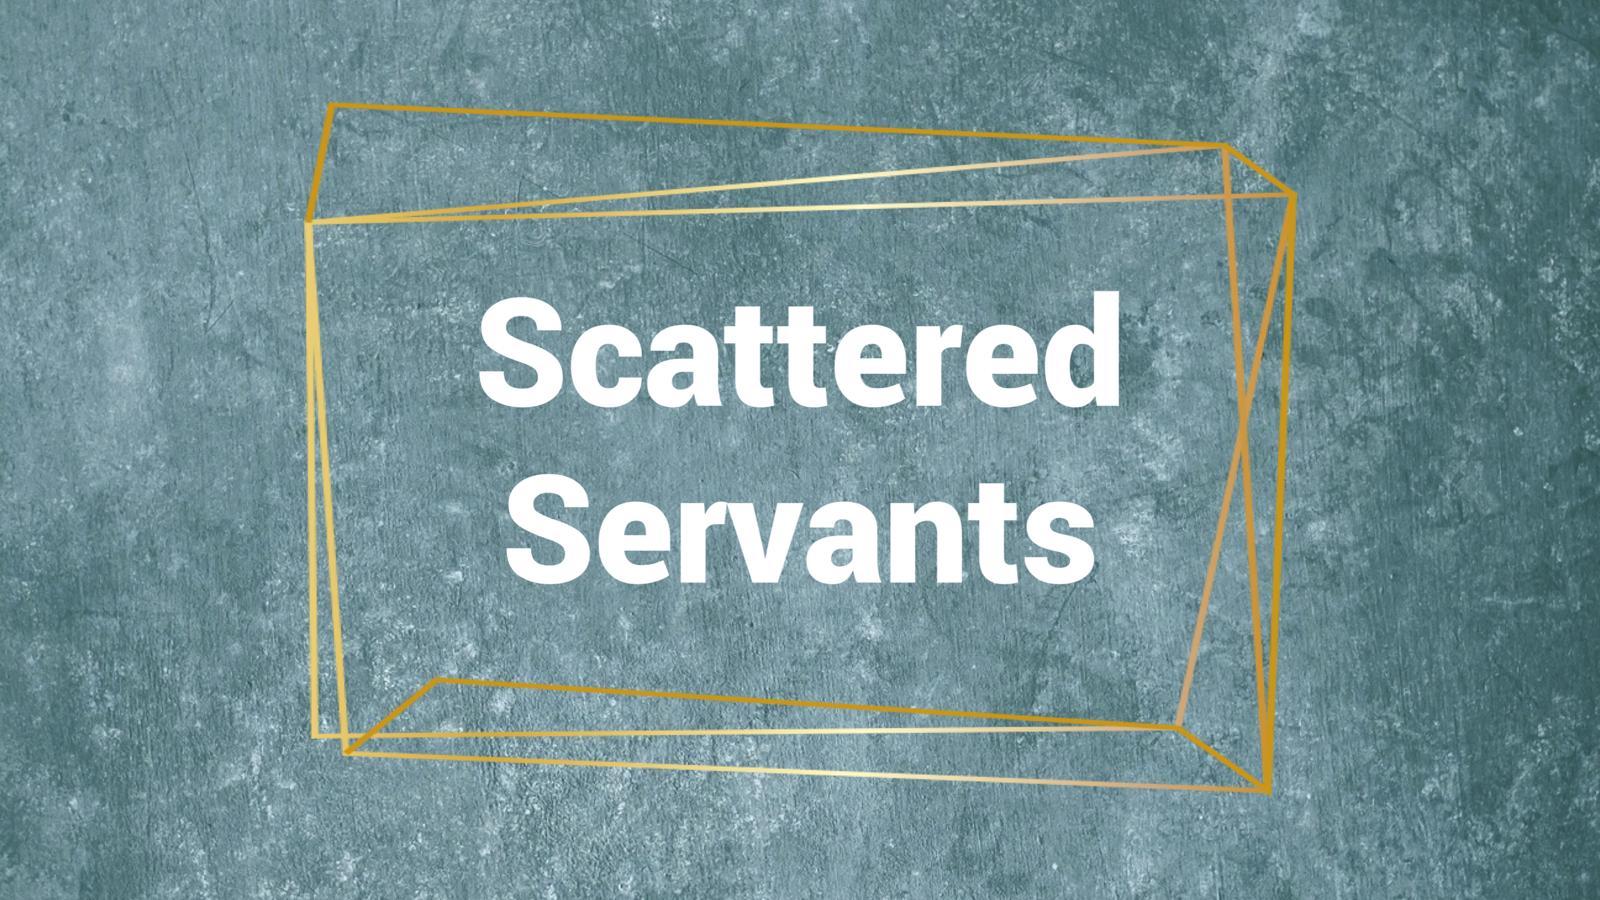 Scattered Servants